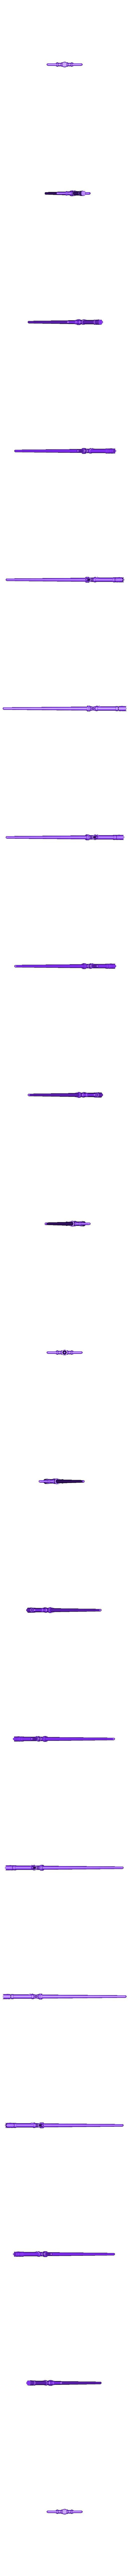 Star Wars VII The Force Awakens Kylo Ren Sword Cosplay Weapon Prop - Lightless_obj.obj Download OBJ file Star Wars VII The Force Awakens Kylo Ren Sword Cosplay Prop • 3D printer object, Blackeveryday